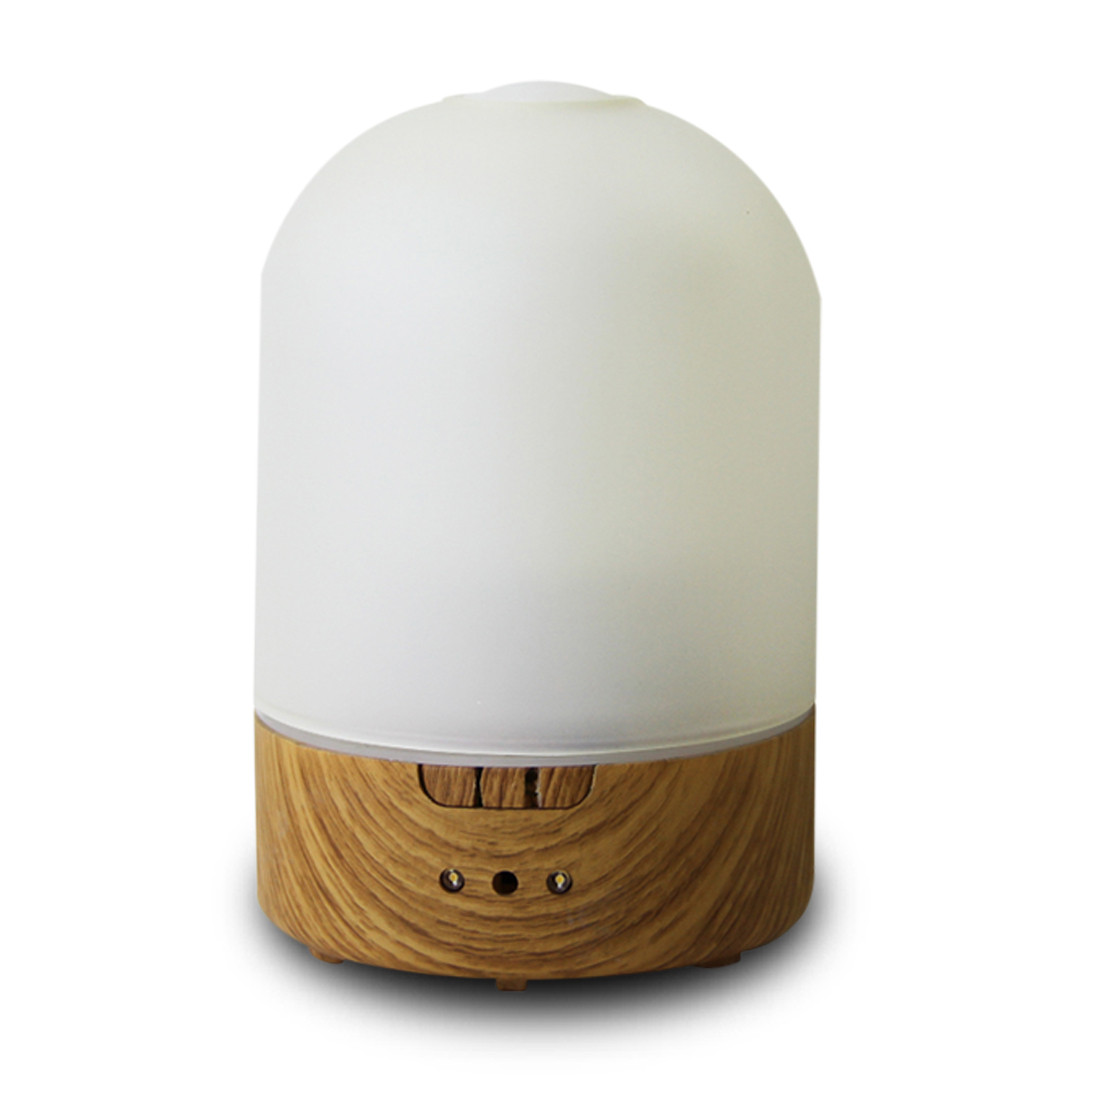 Difusor de aroma de vidrio clásico con 7 color led